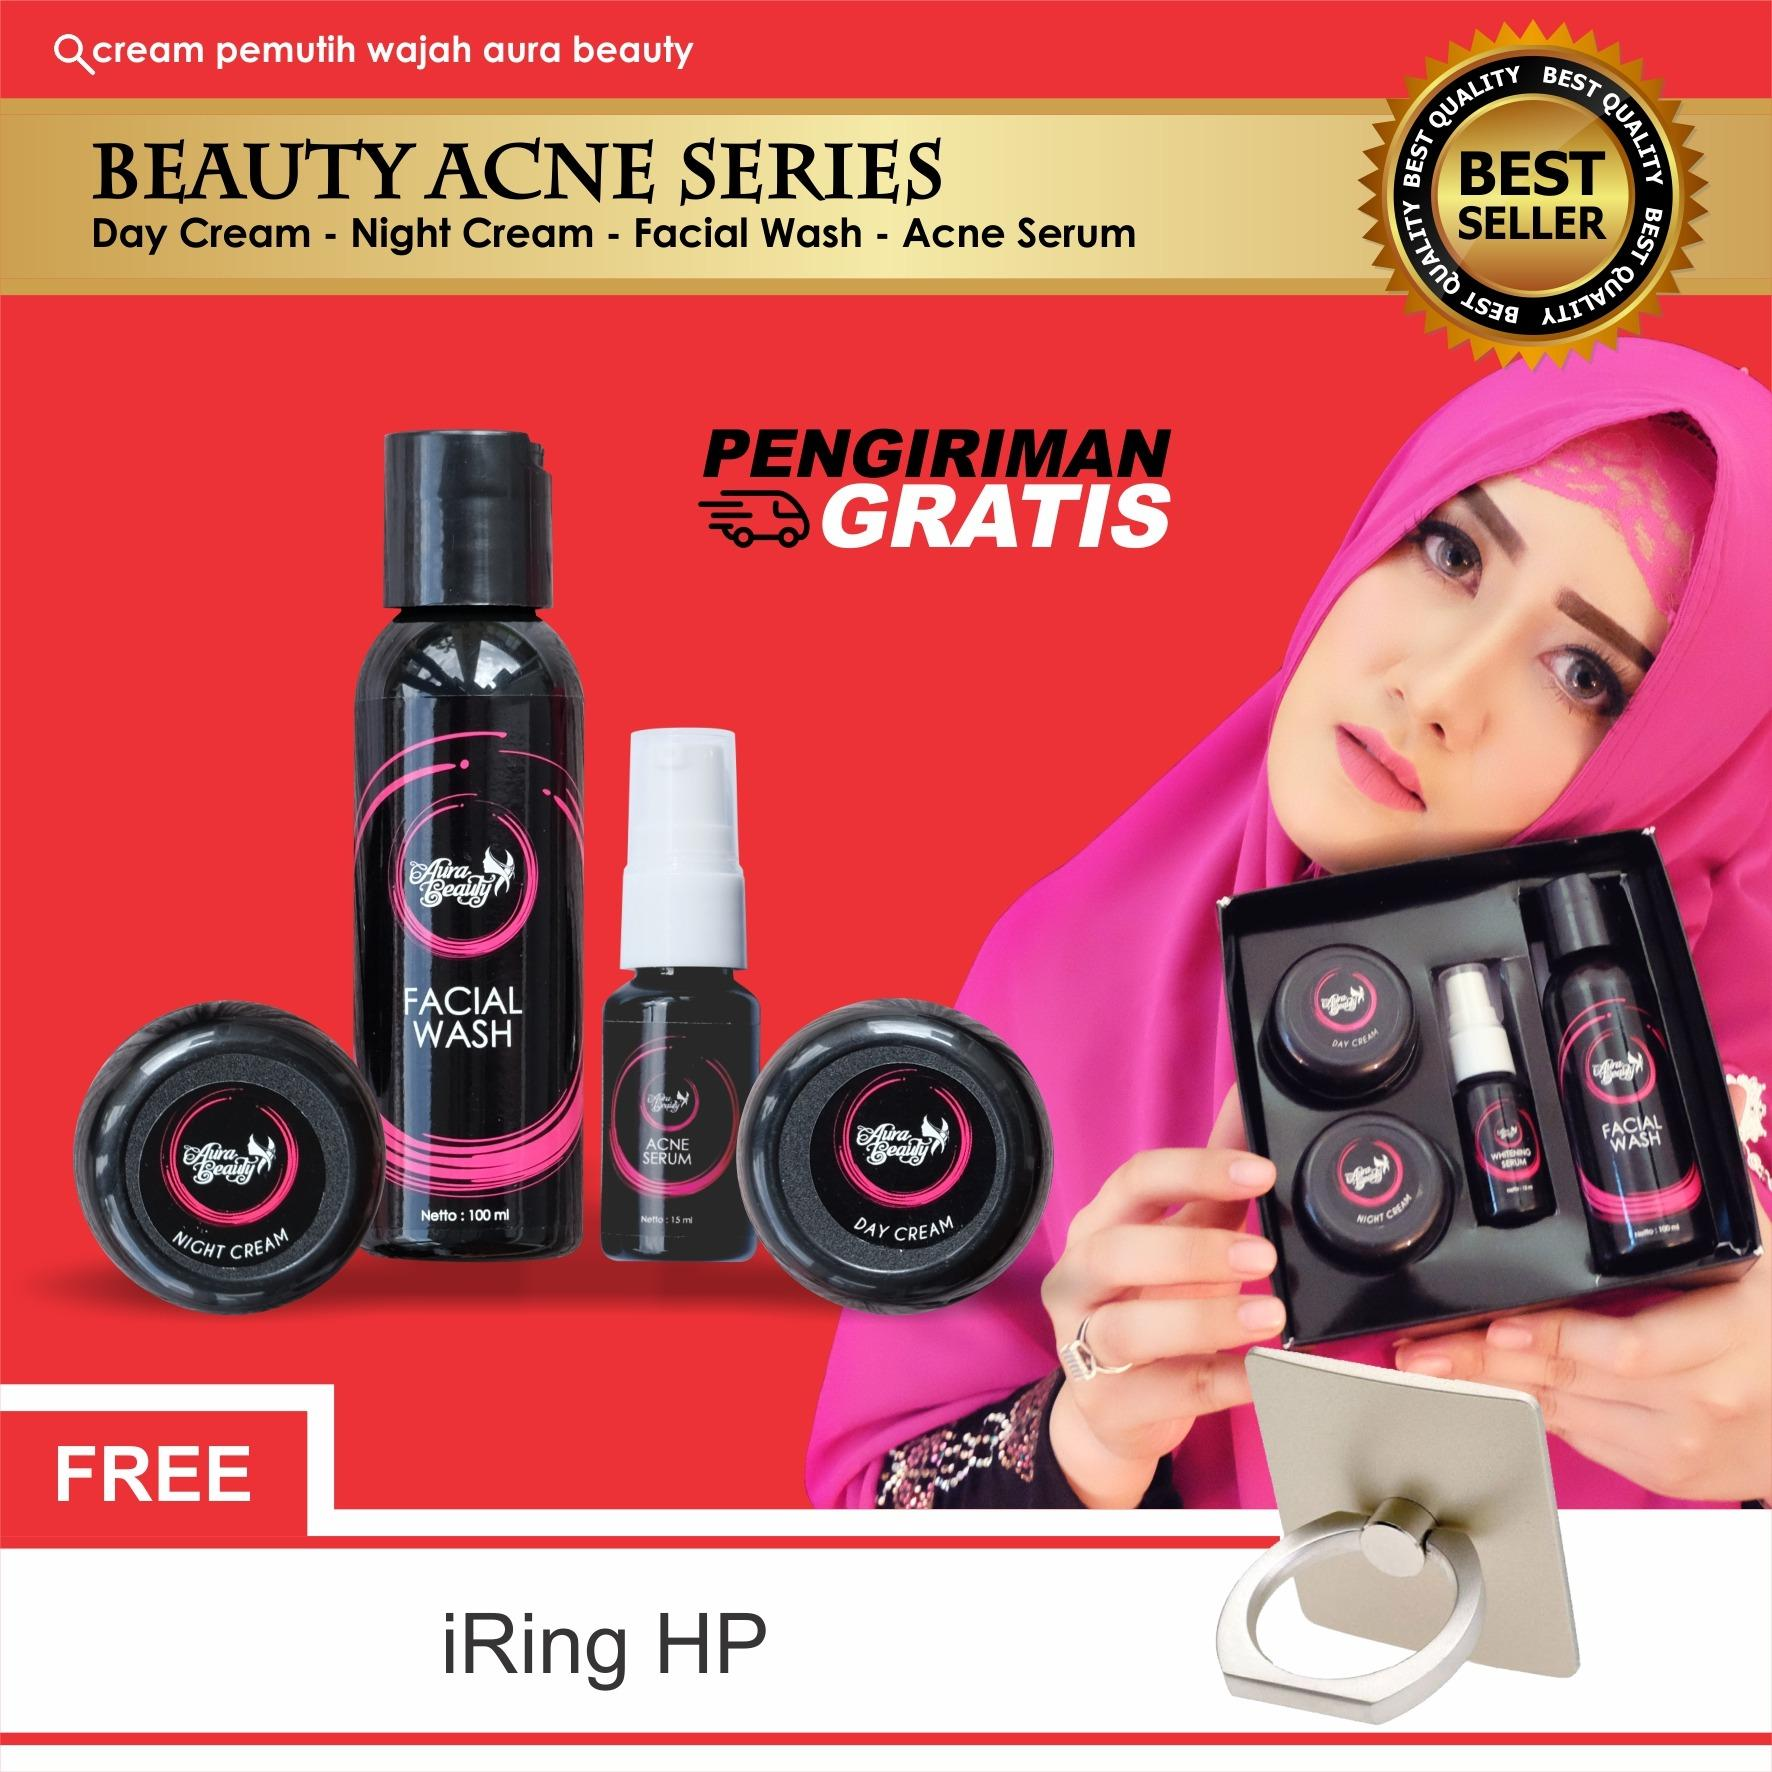 Toko Aura Beauty Cream Wajah Terbaik Terlaris No 01 Memutihkan Dengan Merata Hasil Alami Tidak Pucat F*C**L Wash 100Ml Dekat Sini